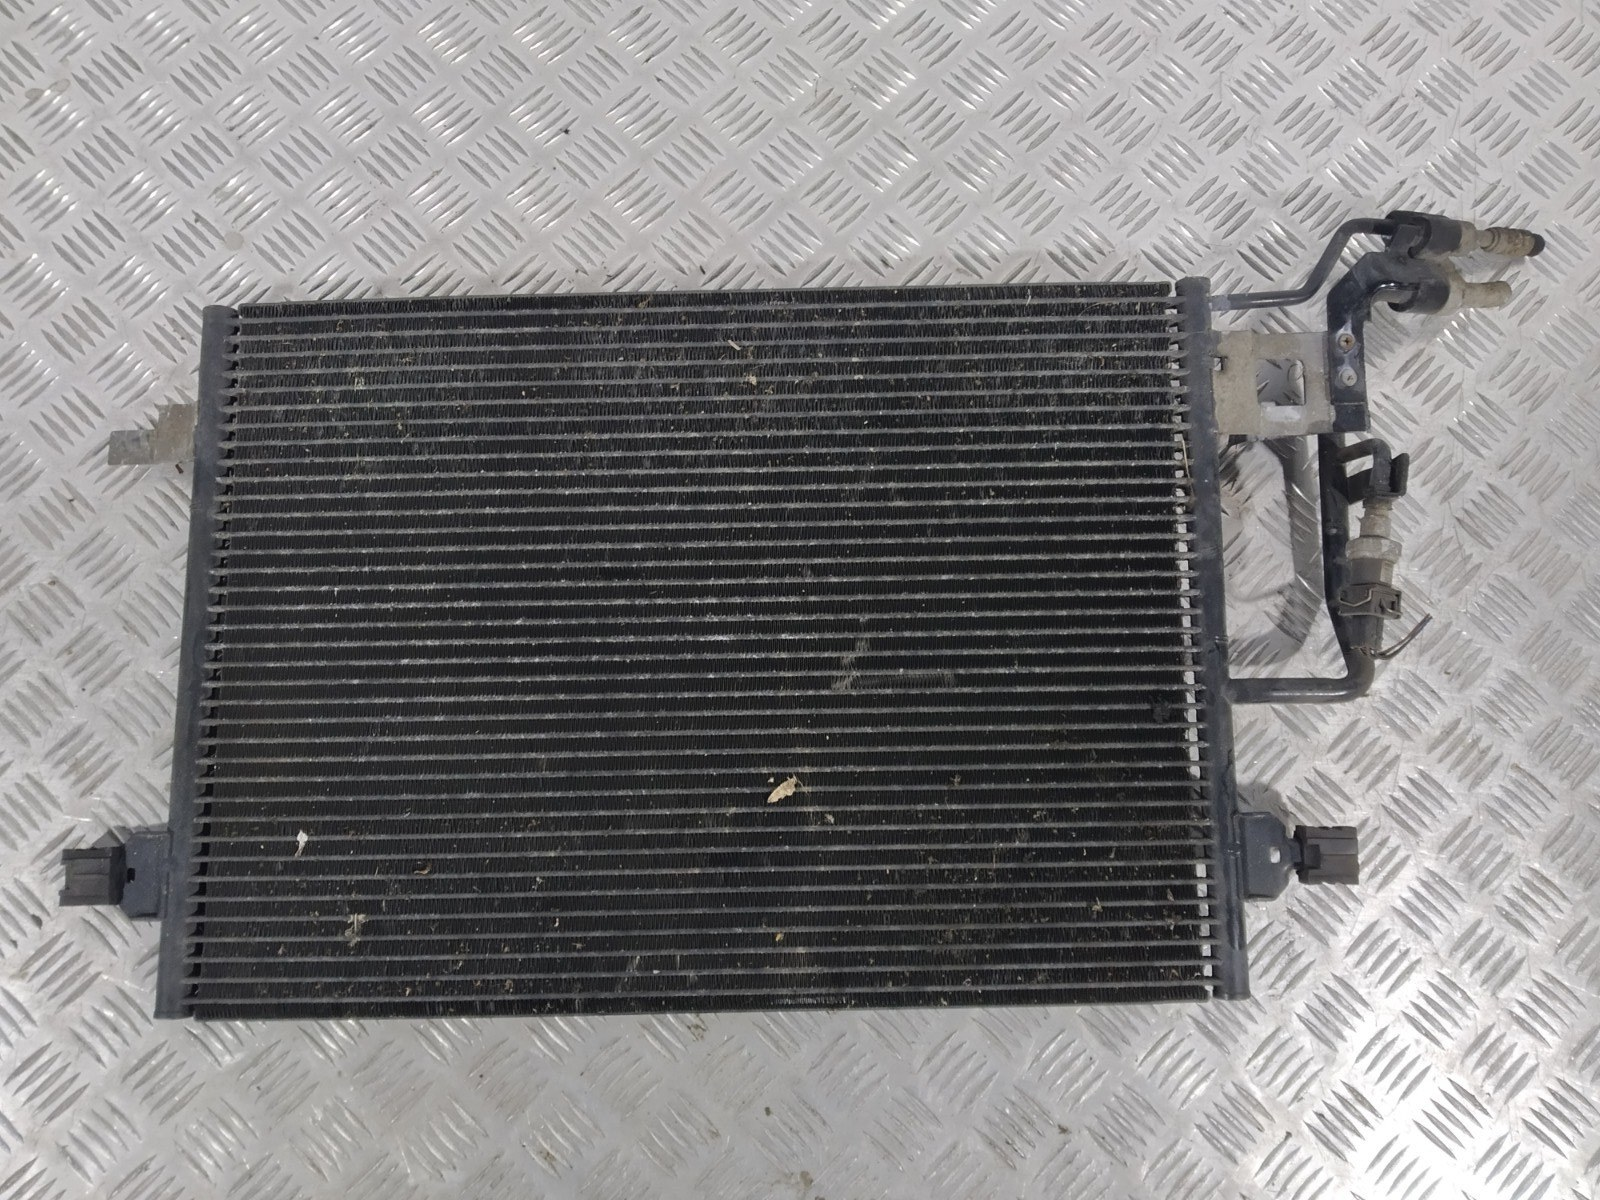 Радиатор кондиционера Volkswagen Passat B5 2.0 I 2001 (б/у)